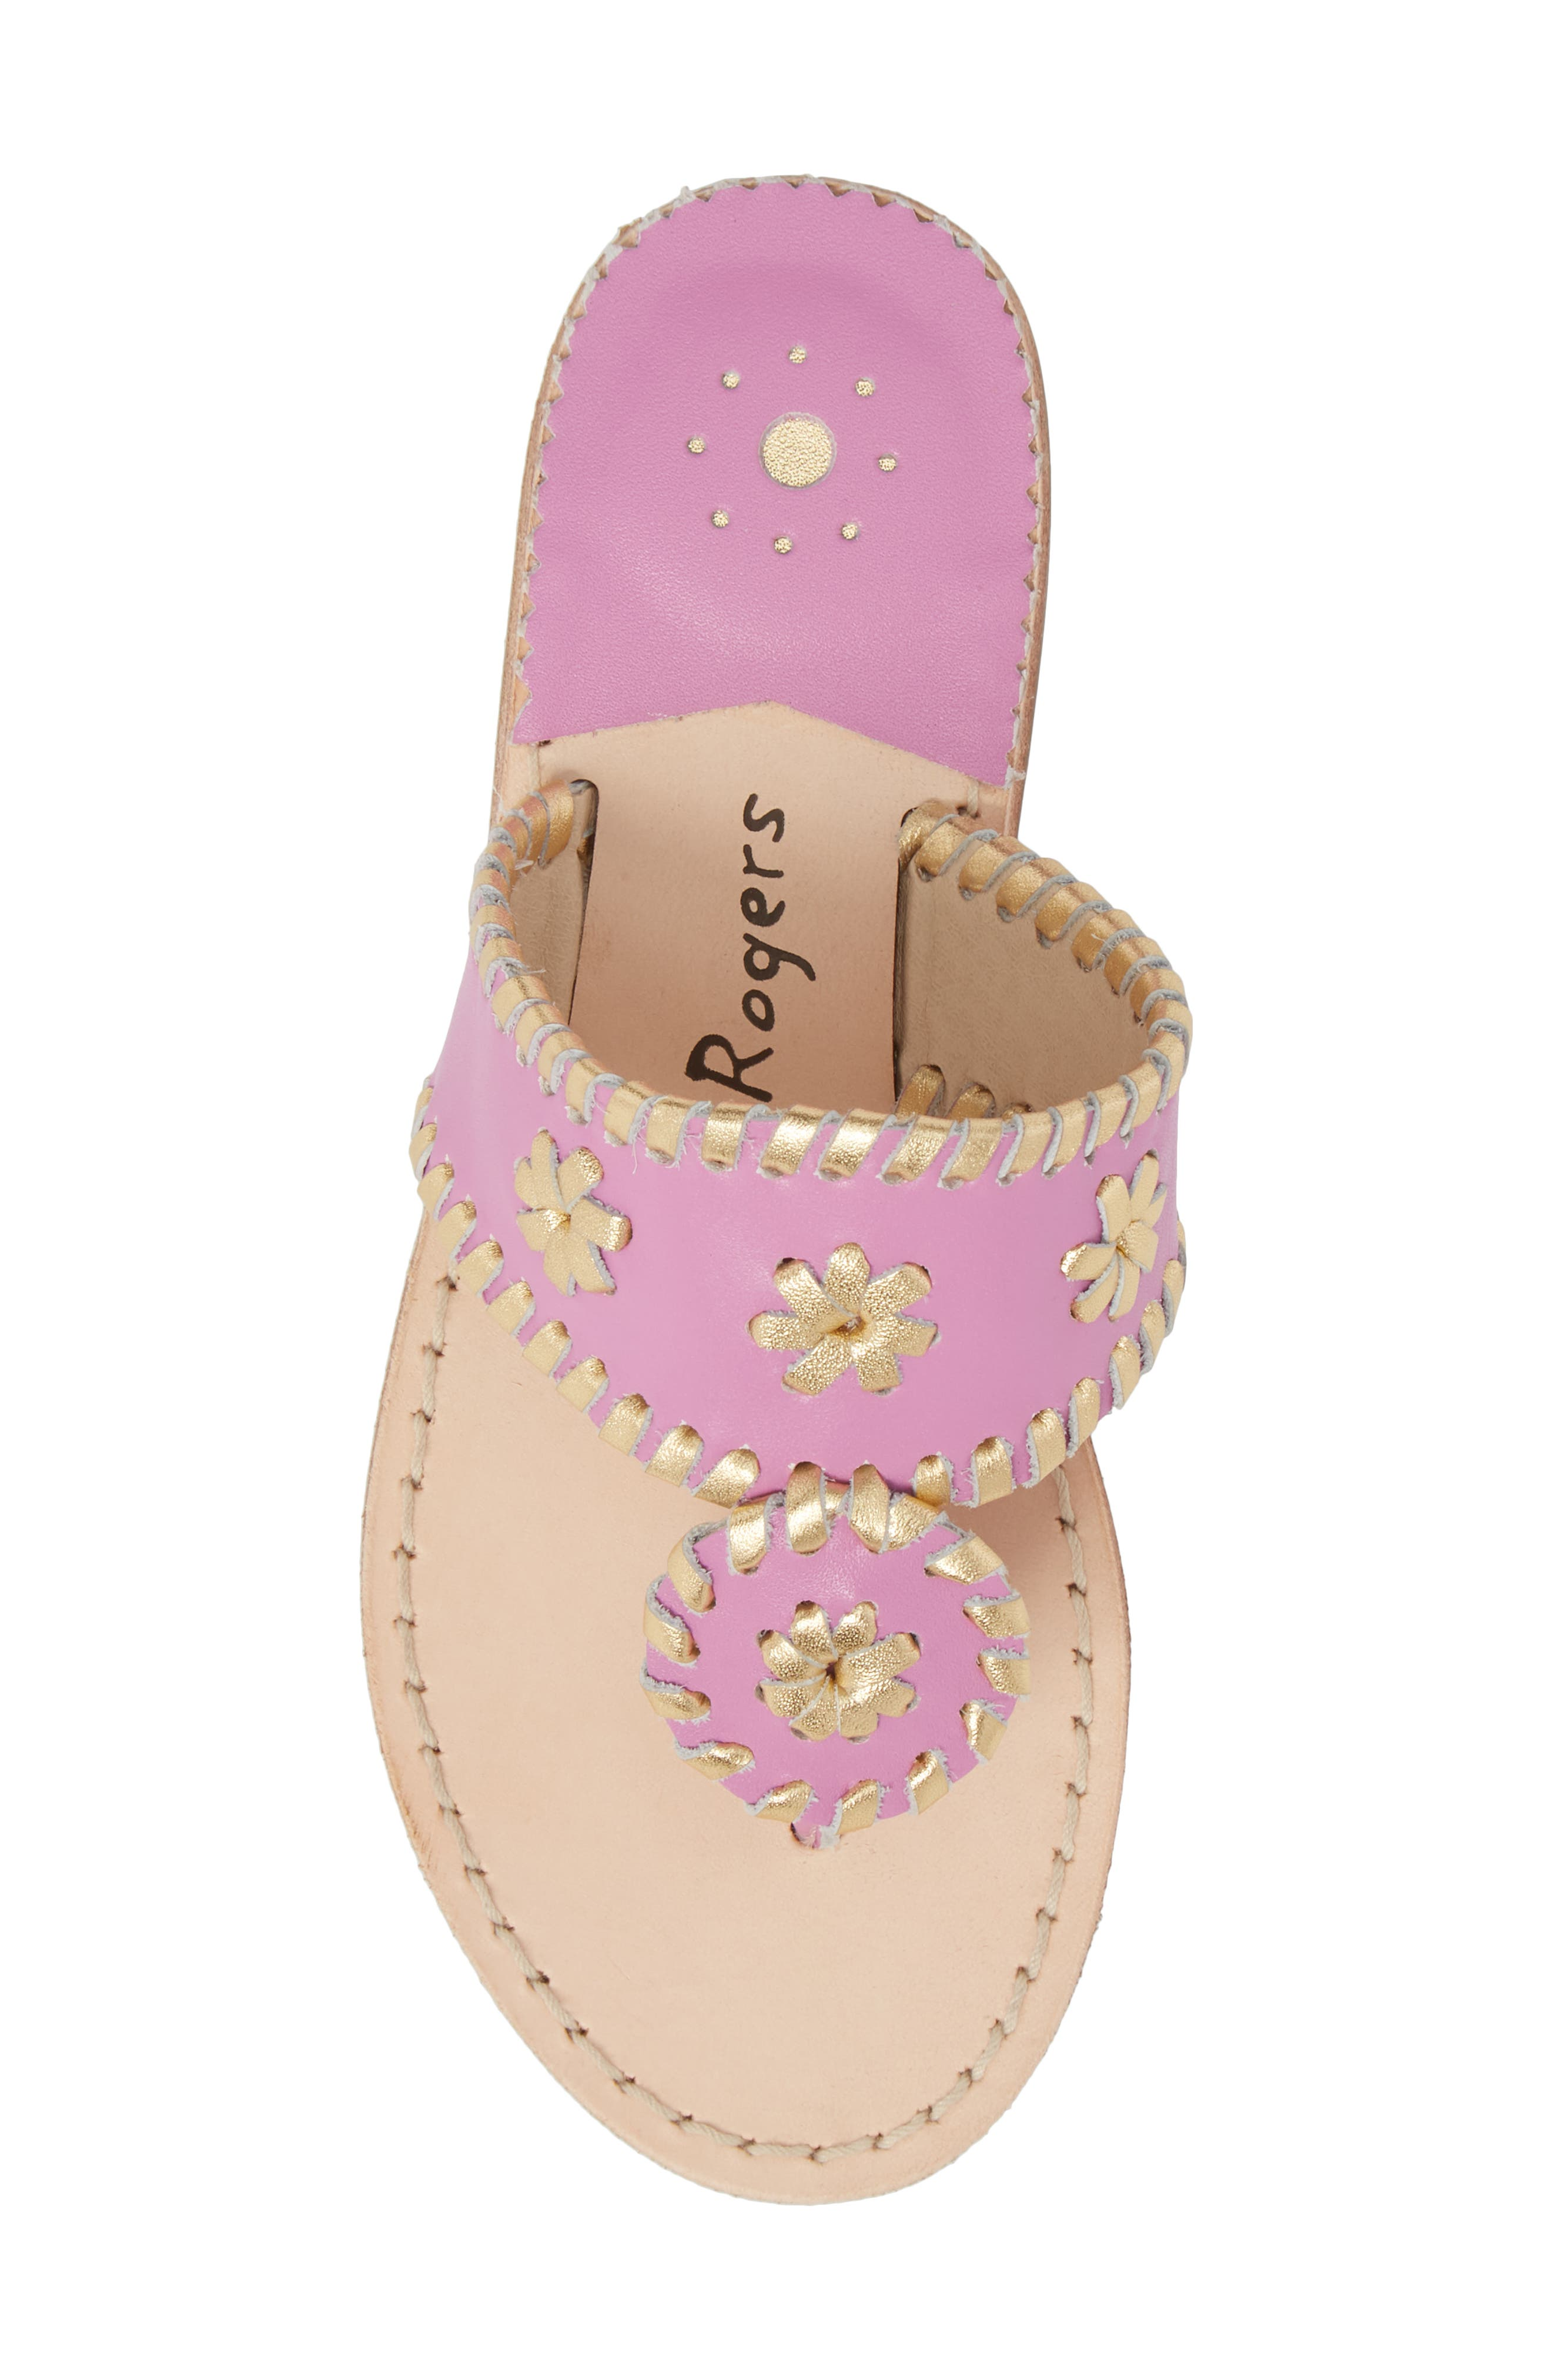 Miss Hollis Metallic Trim Thong Sandal,                             Alternate thumbnail 5, color,                             Lavender Pink/ Gold Leather